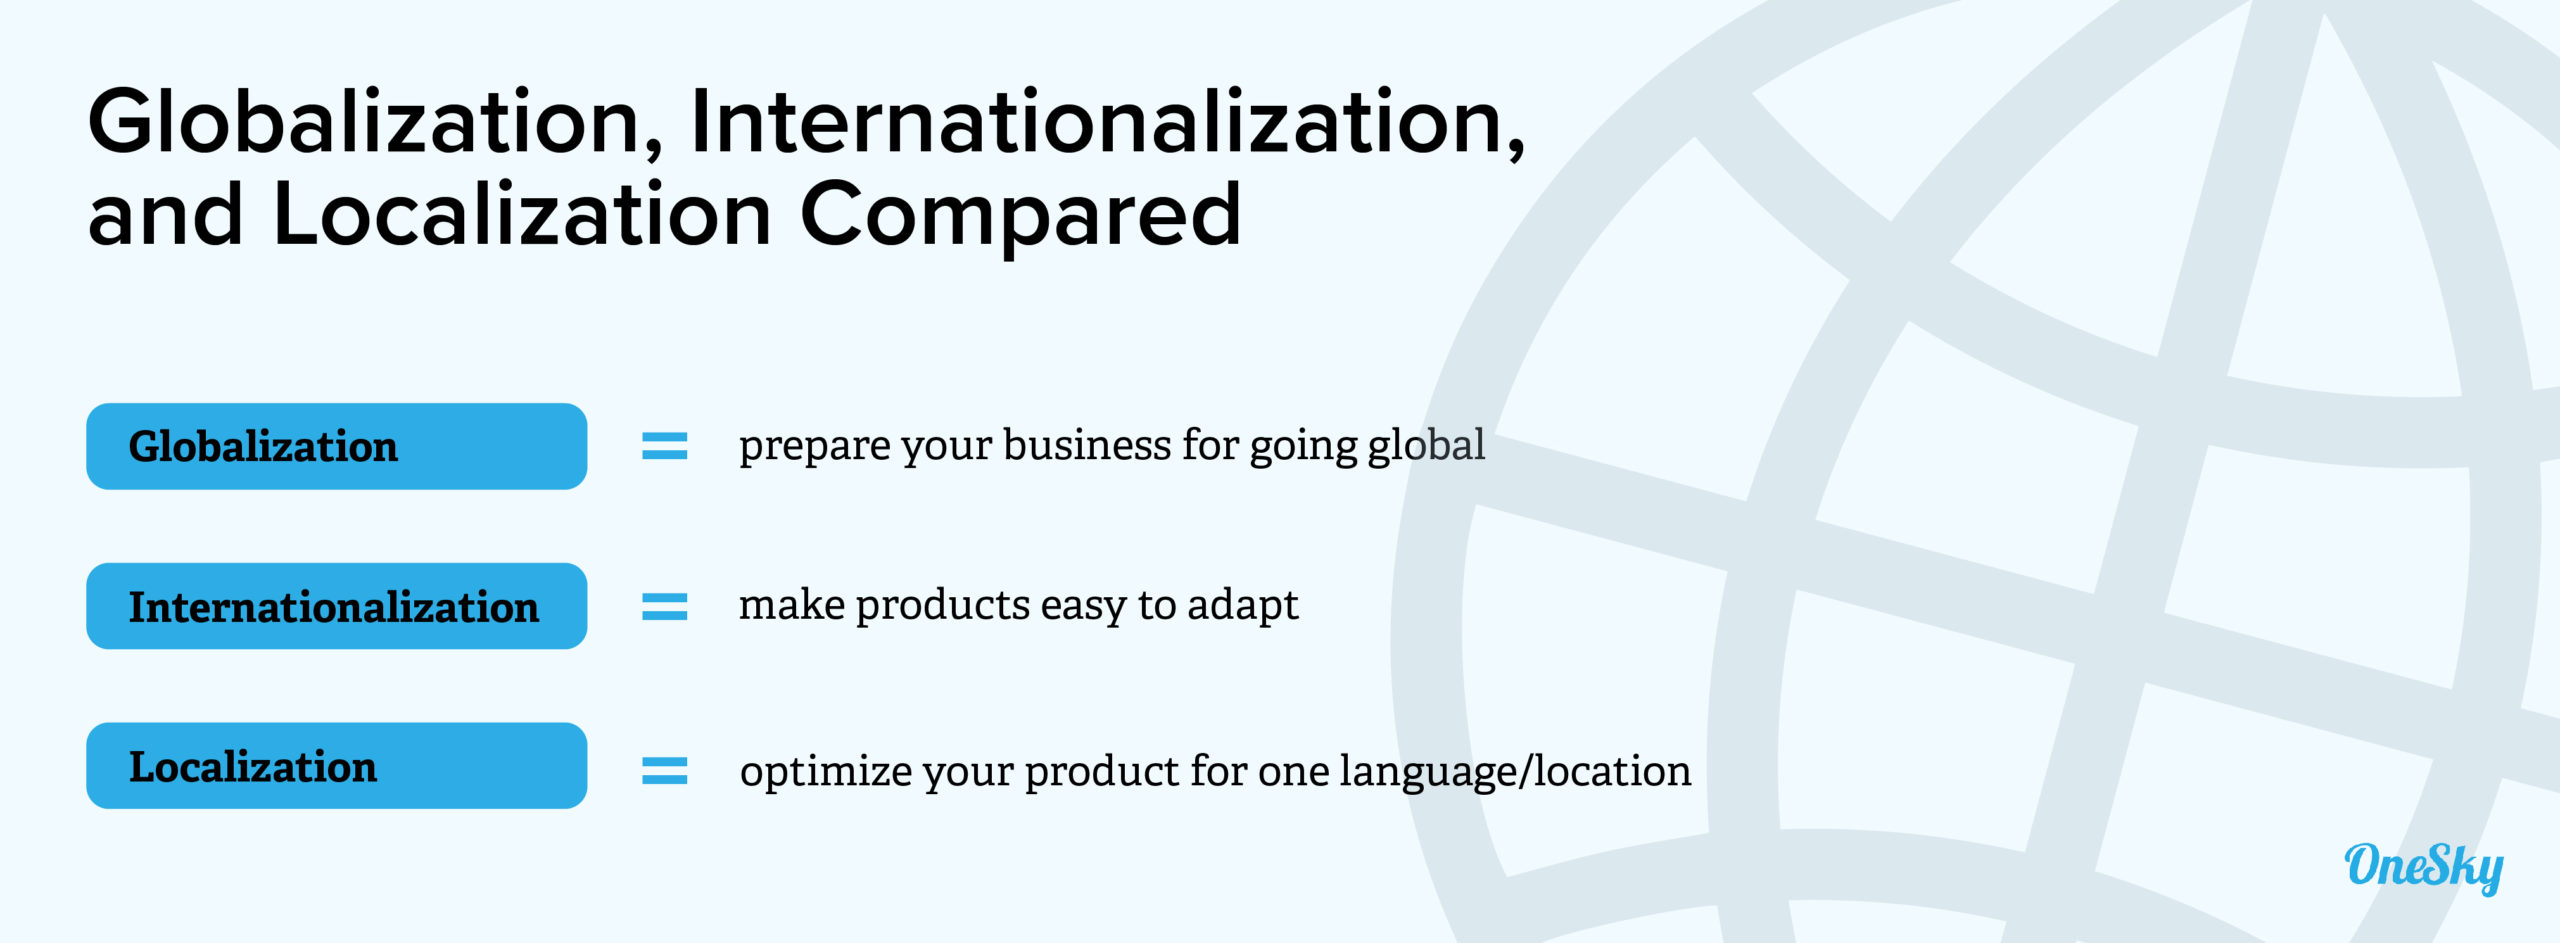 Globalization vs. Internationalization vs. Localization